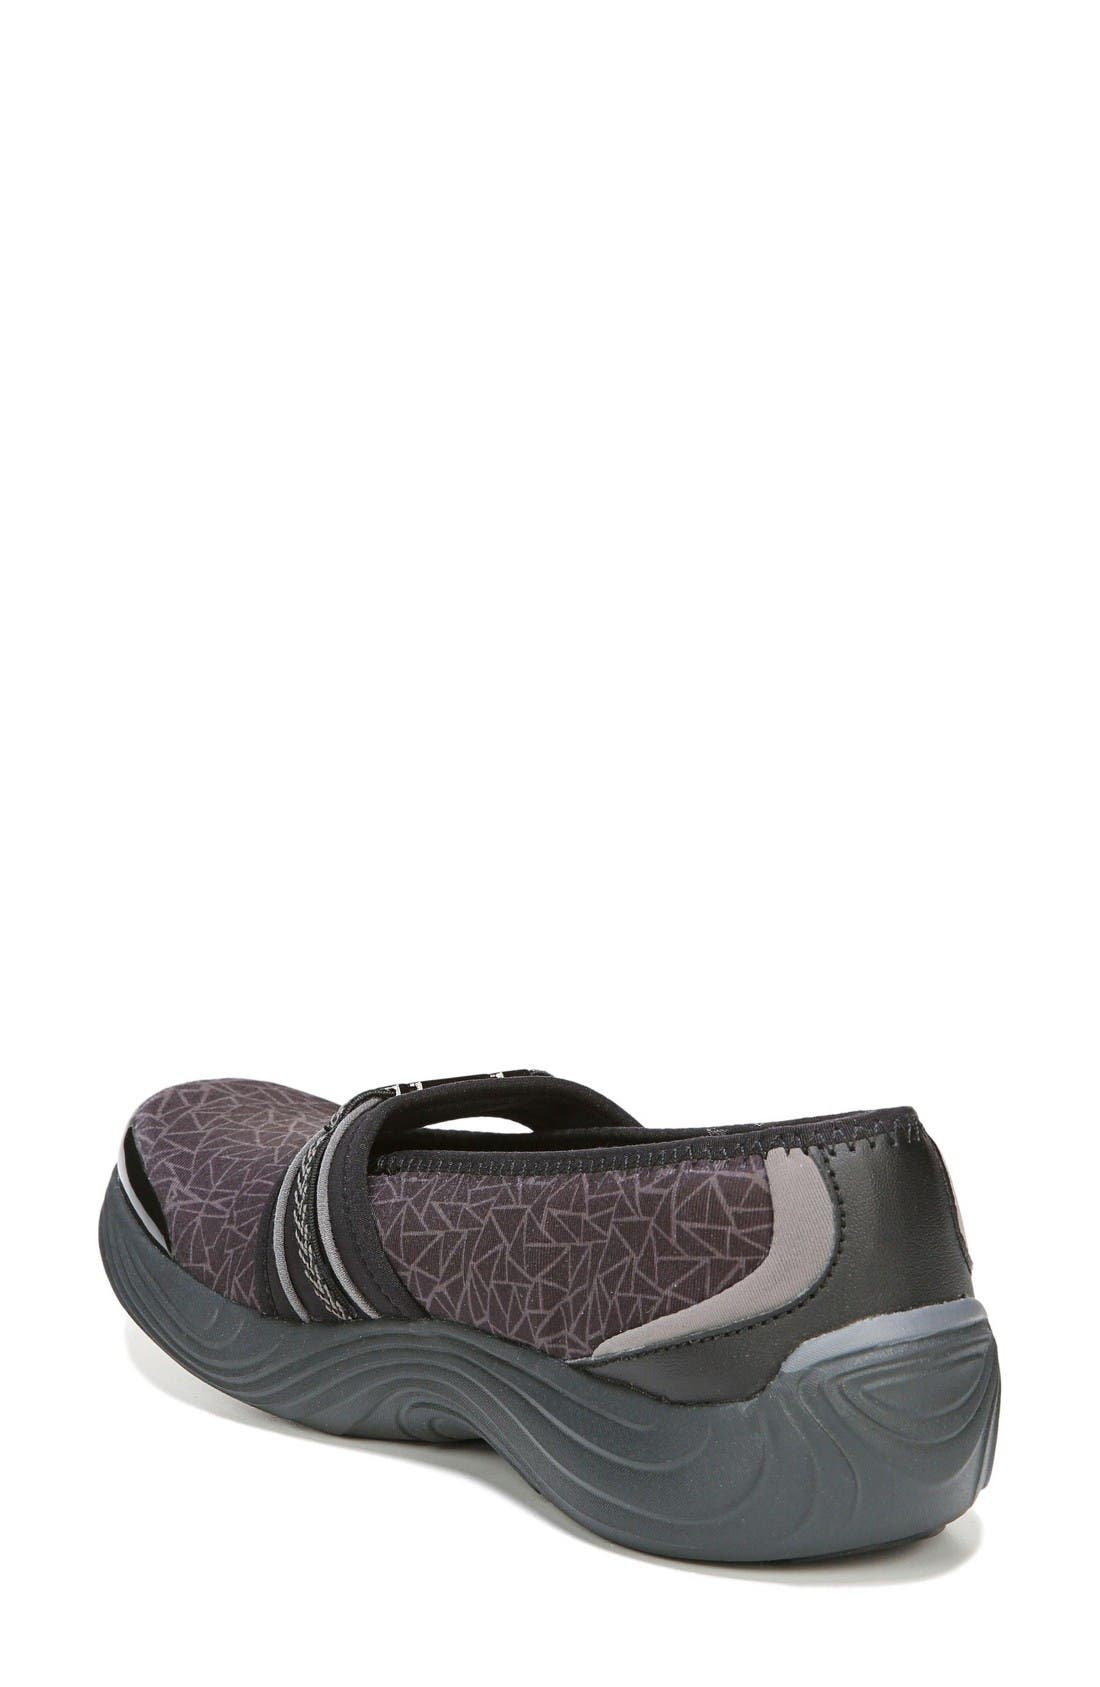 Alternate Image 2  - BZees Twinkle Slip-On Sneaker (Women)